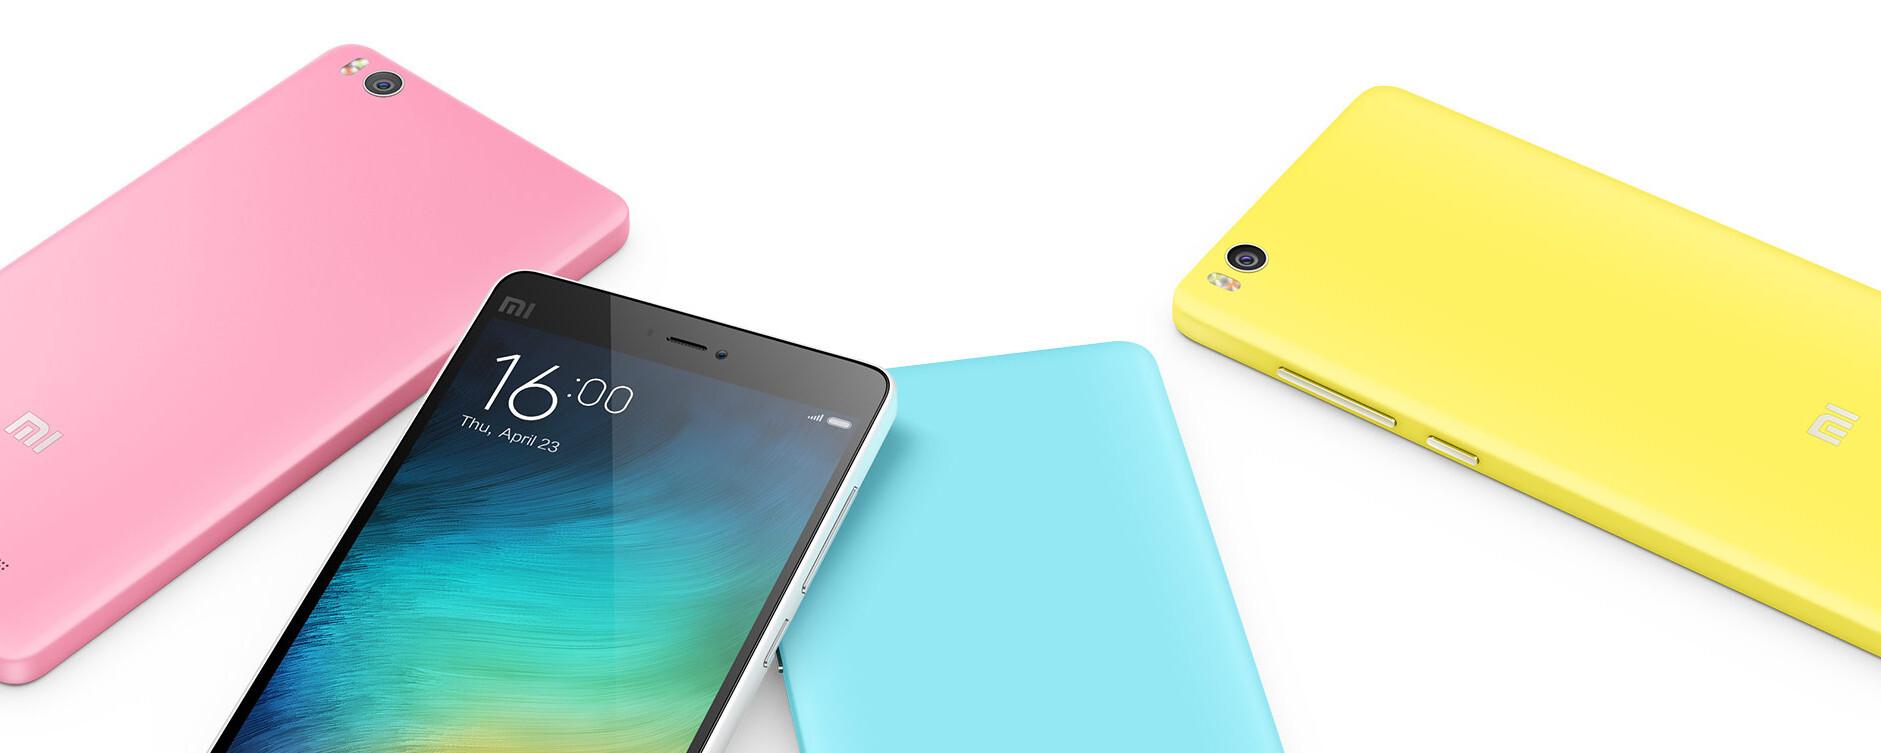 http://i-cdn.phonearena.com/images/articles/183269-image/Xiaomi-Mi-4-official-images.jpg